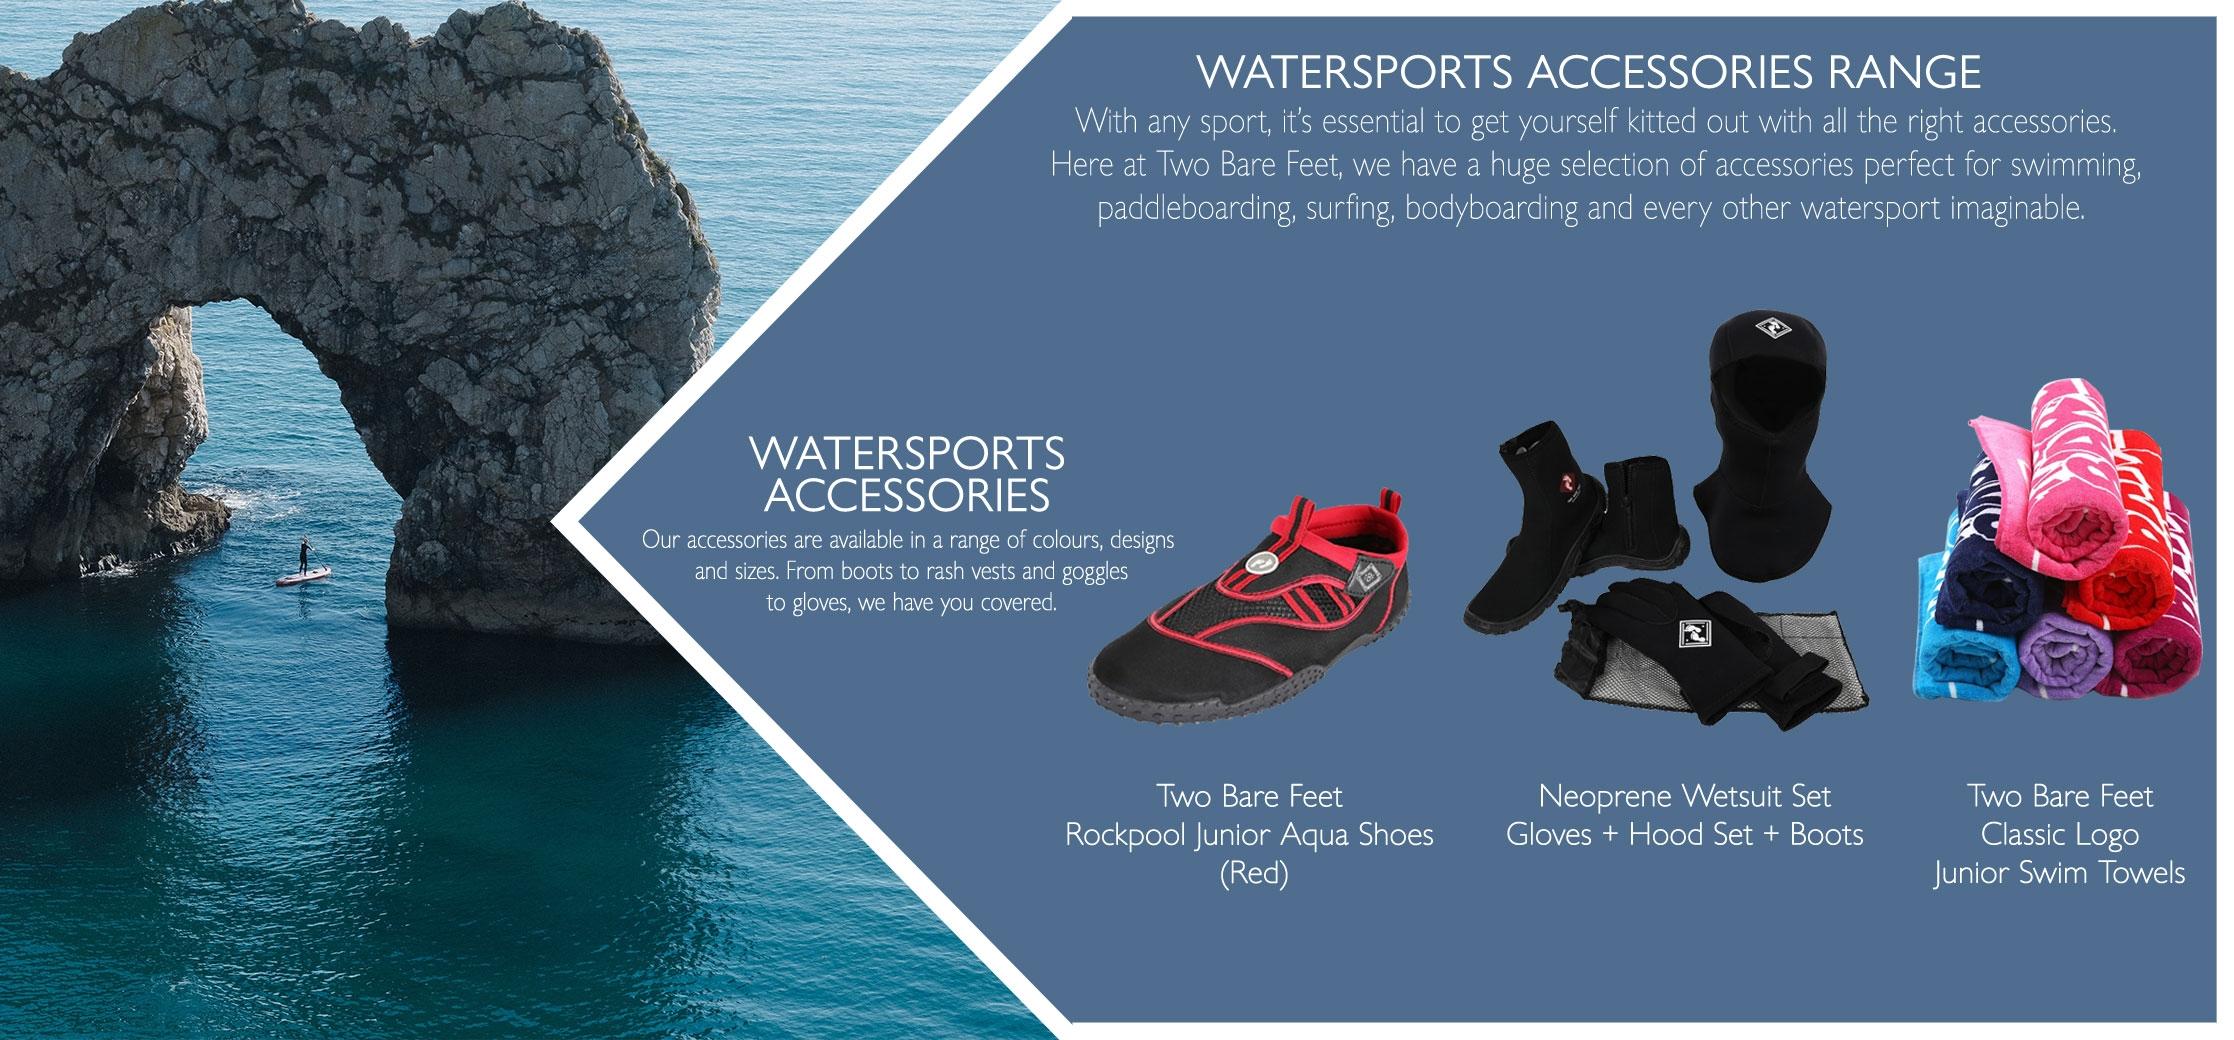 Watersport accessories types